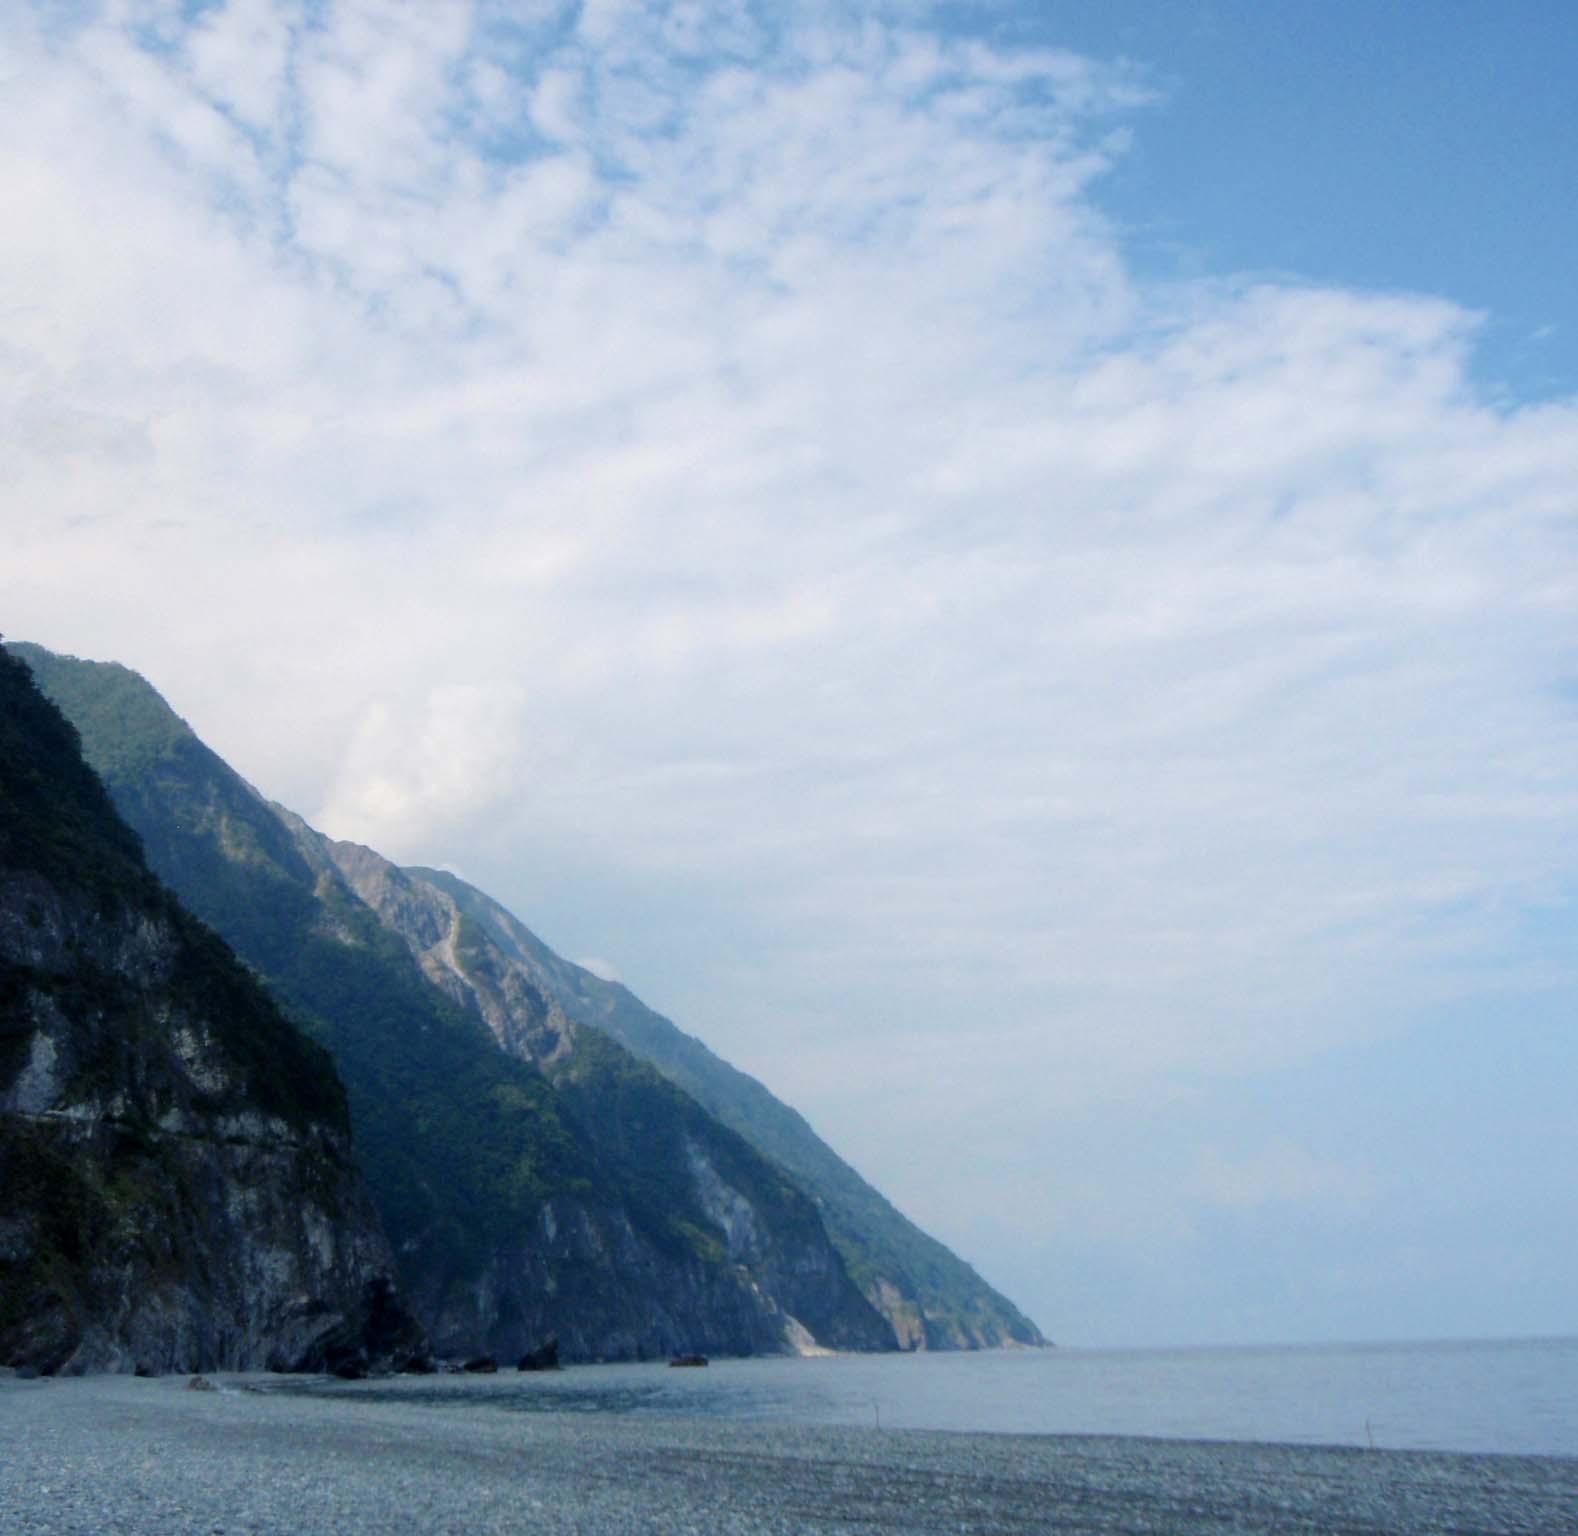 Cingshuei cliffs 8-27-08.jpg